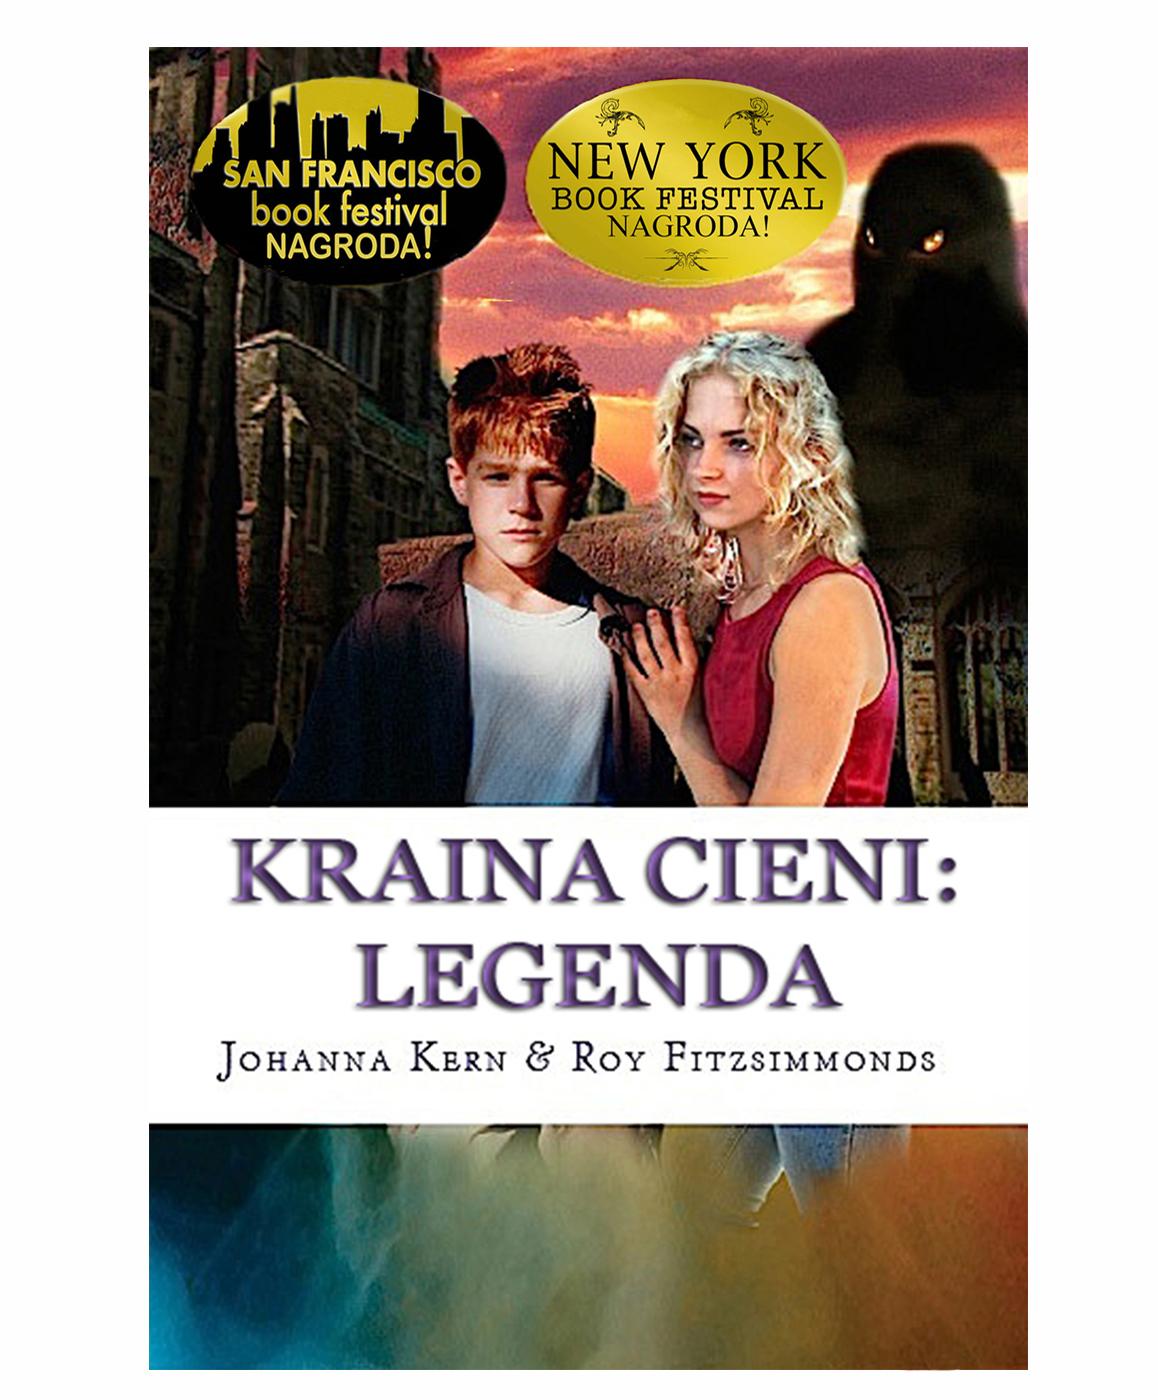 Kraina Cieni: Legenda_okladka